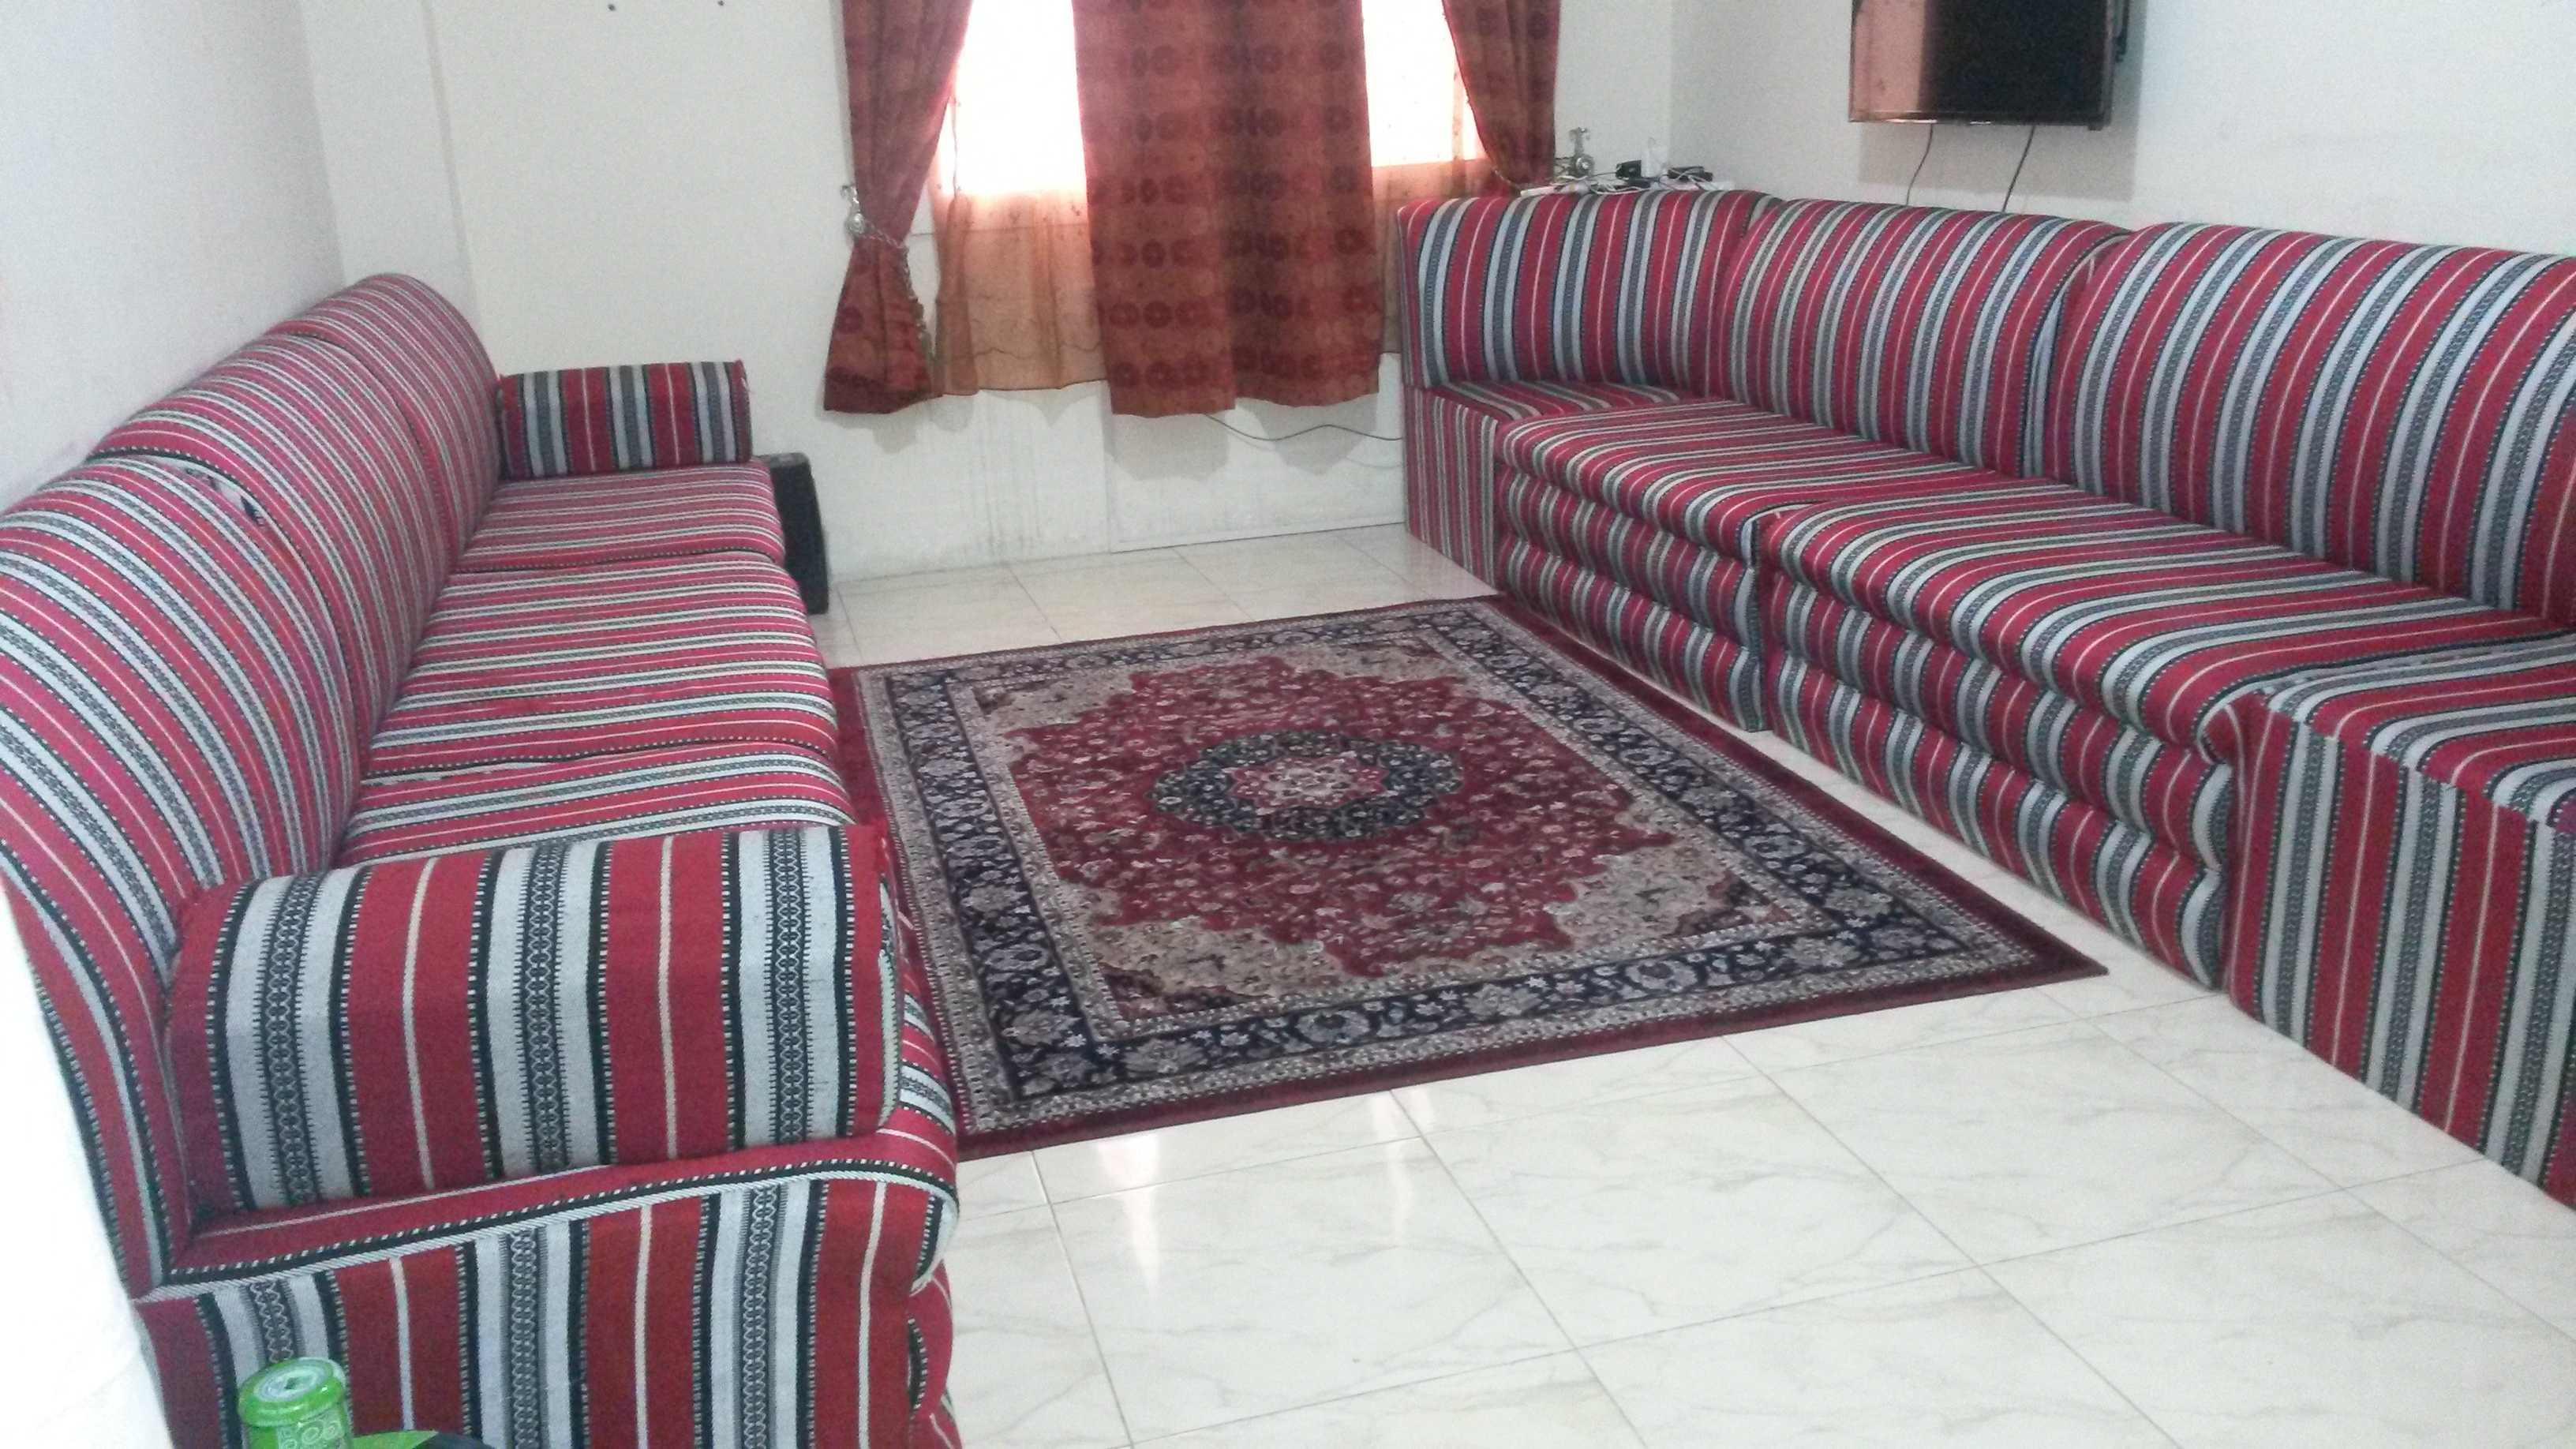 Arabic Majlis Furniture For Sale Interior Design Photos Gallery